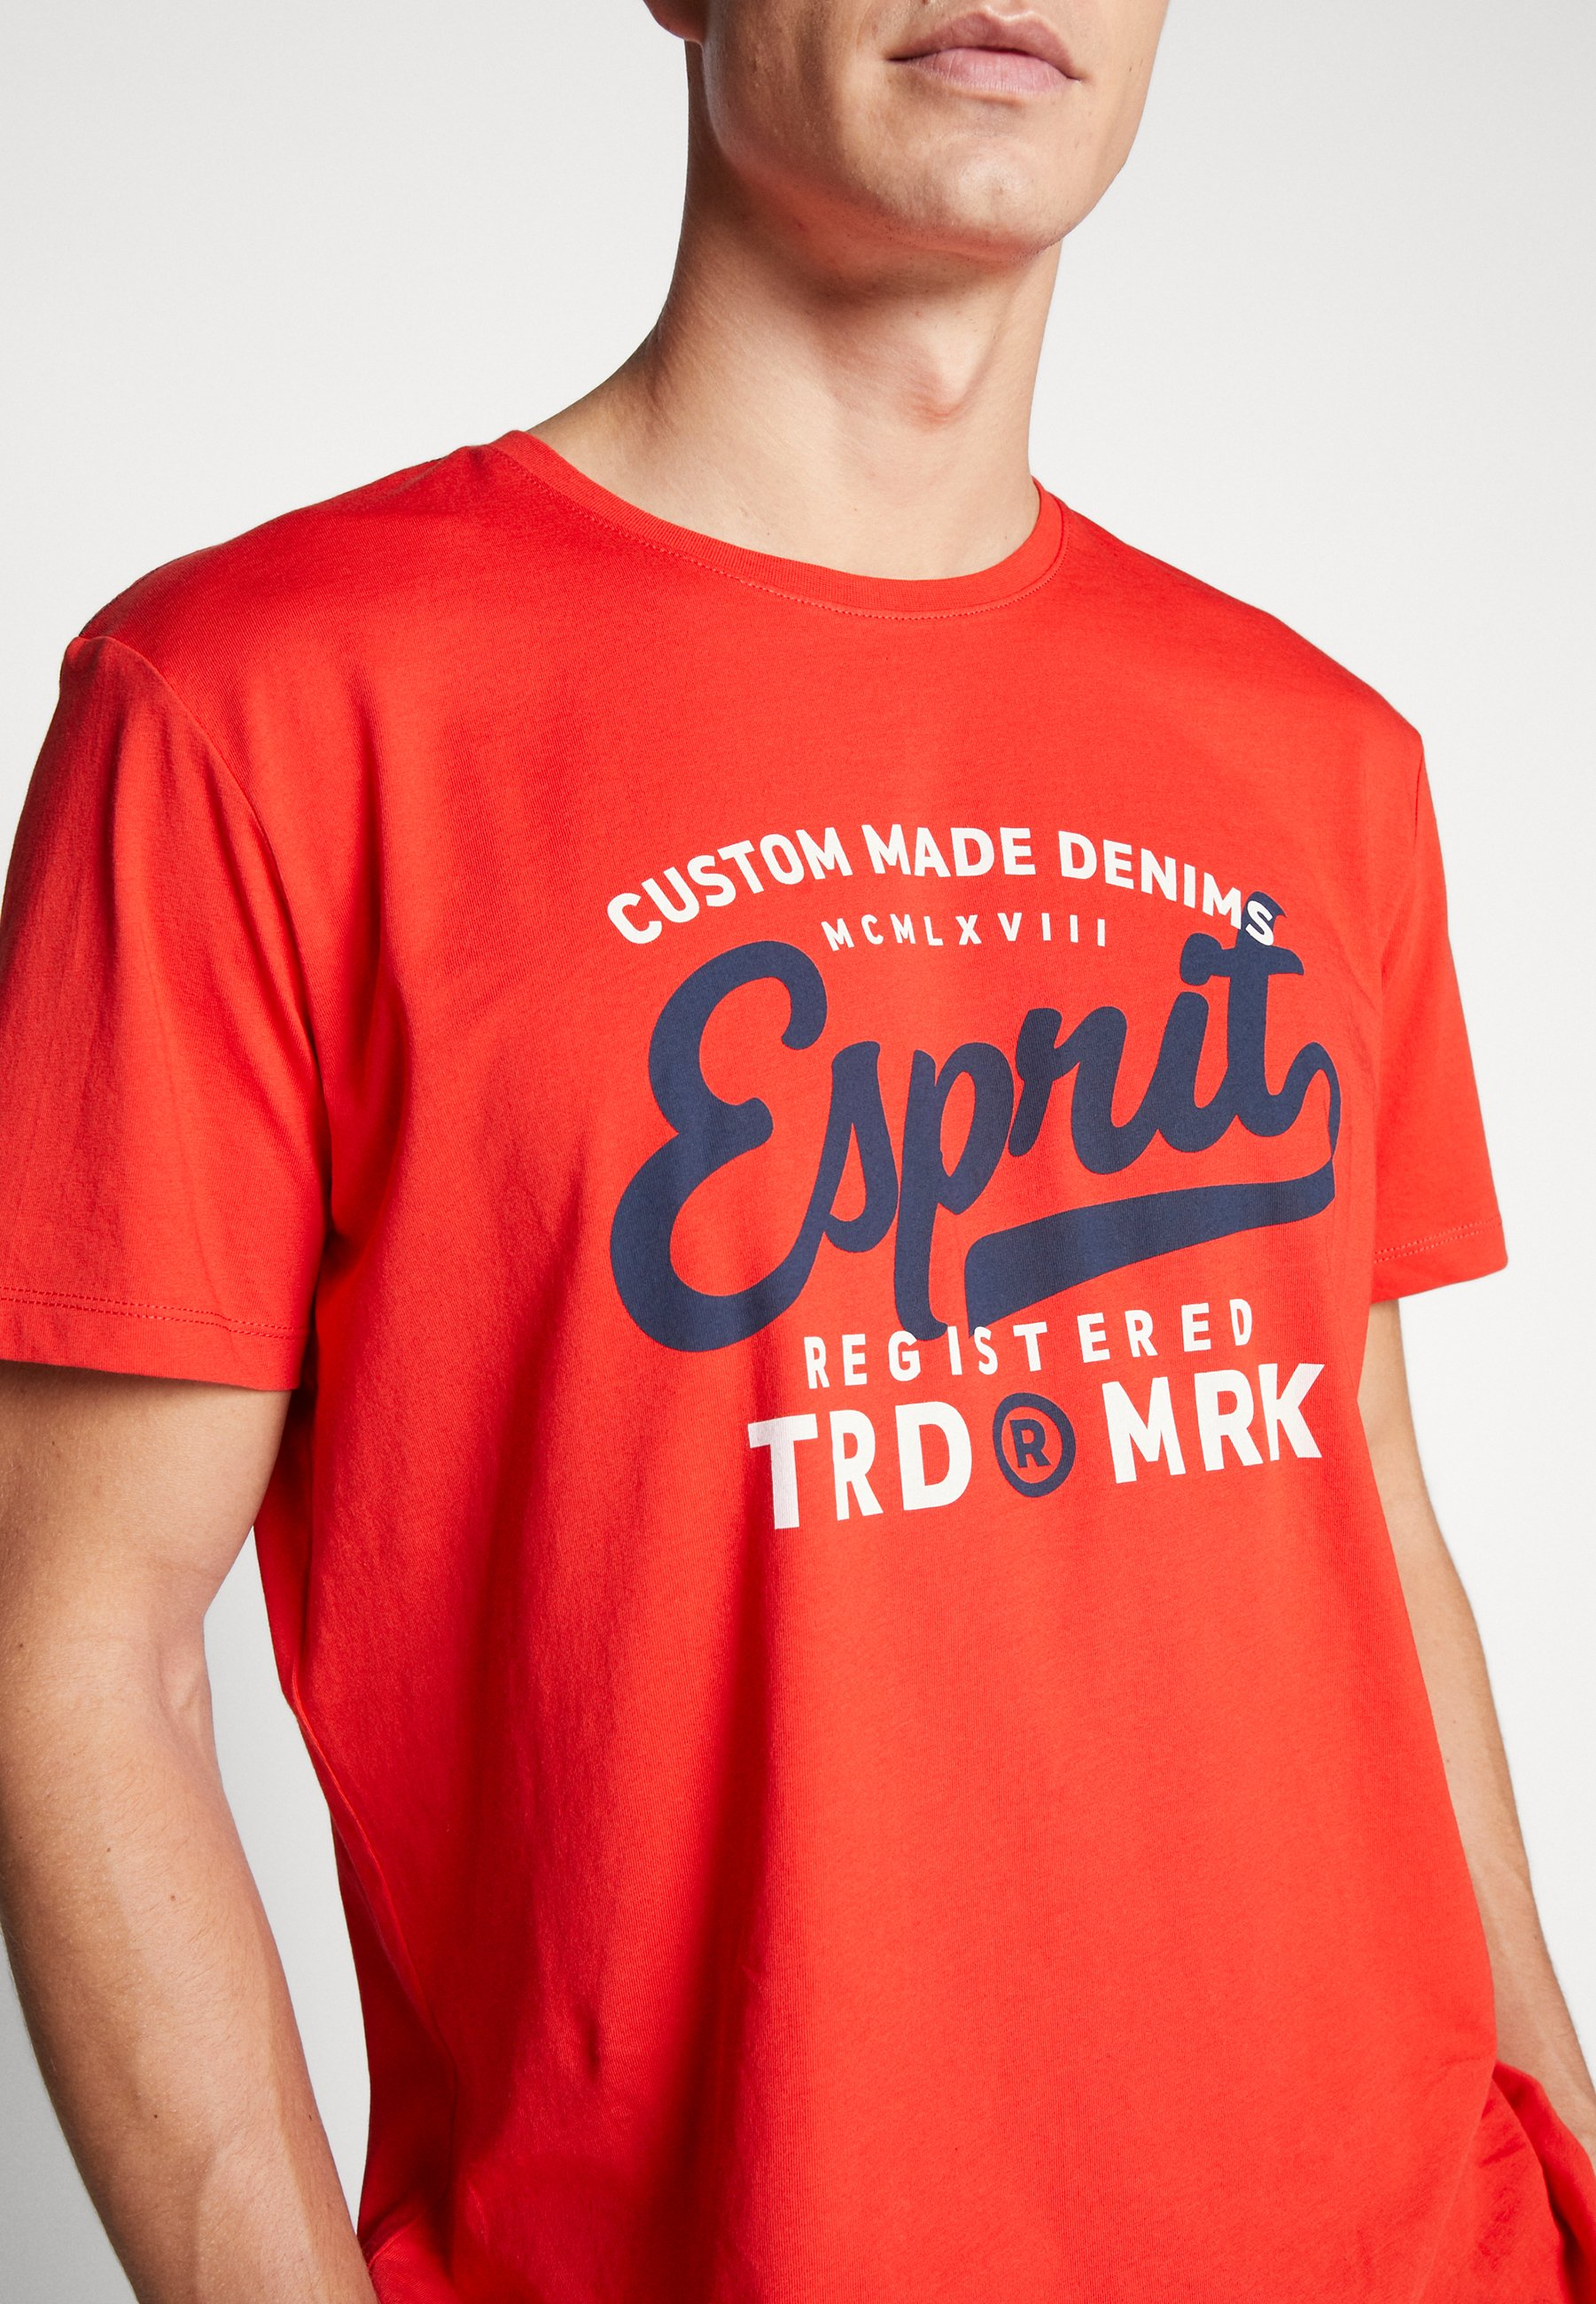 Esprit Print T-shirt - orange red buFik